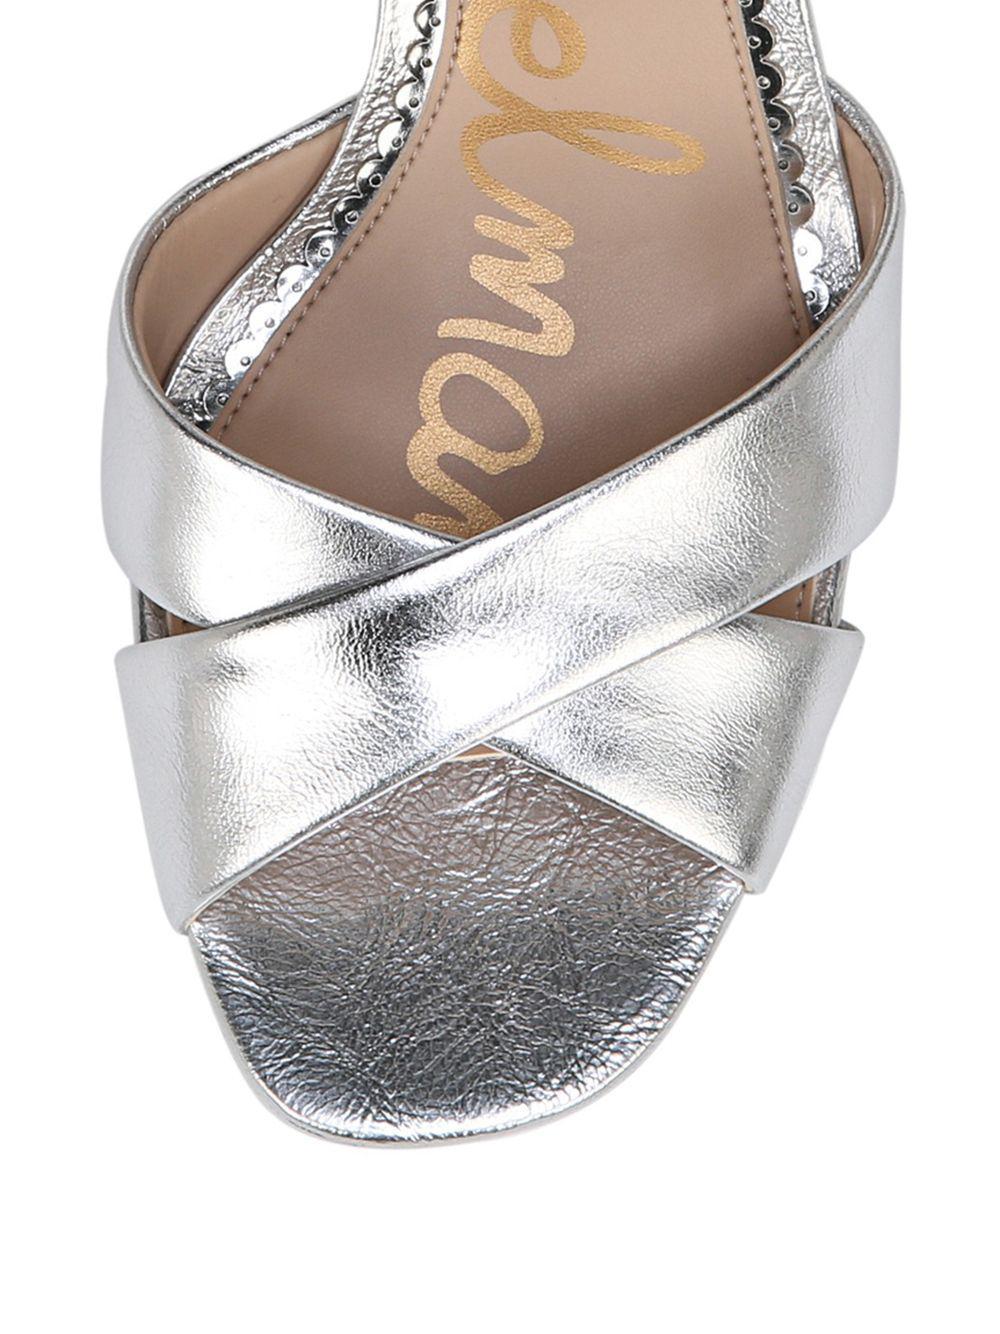 64538bcc1f04 Sam Edelman - Jolene Metallic Leather Platform Sandals - Lyst. View  fullscreen